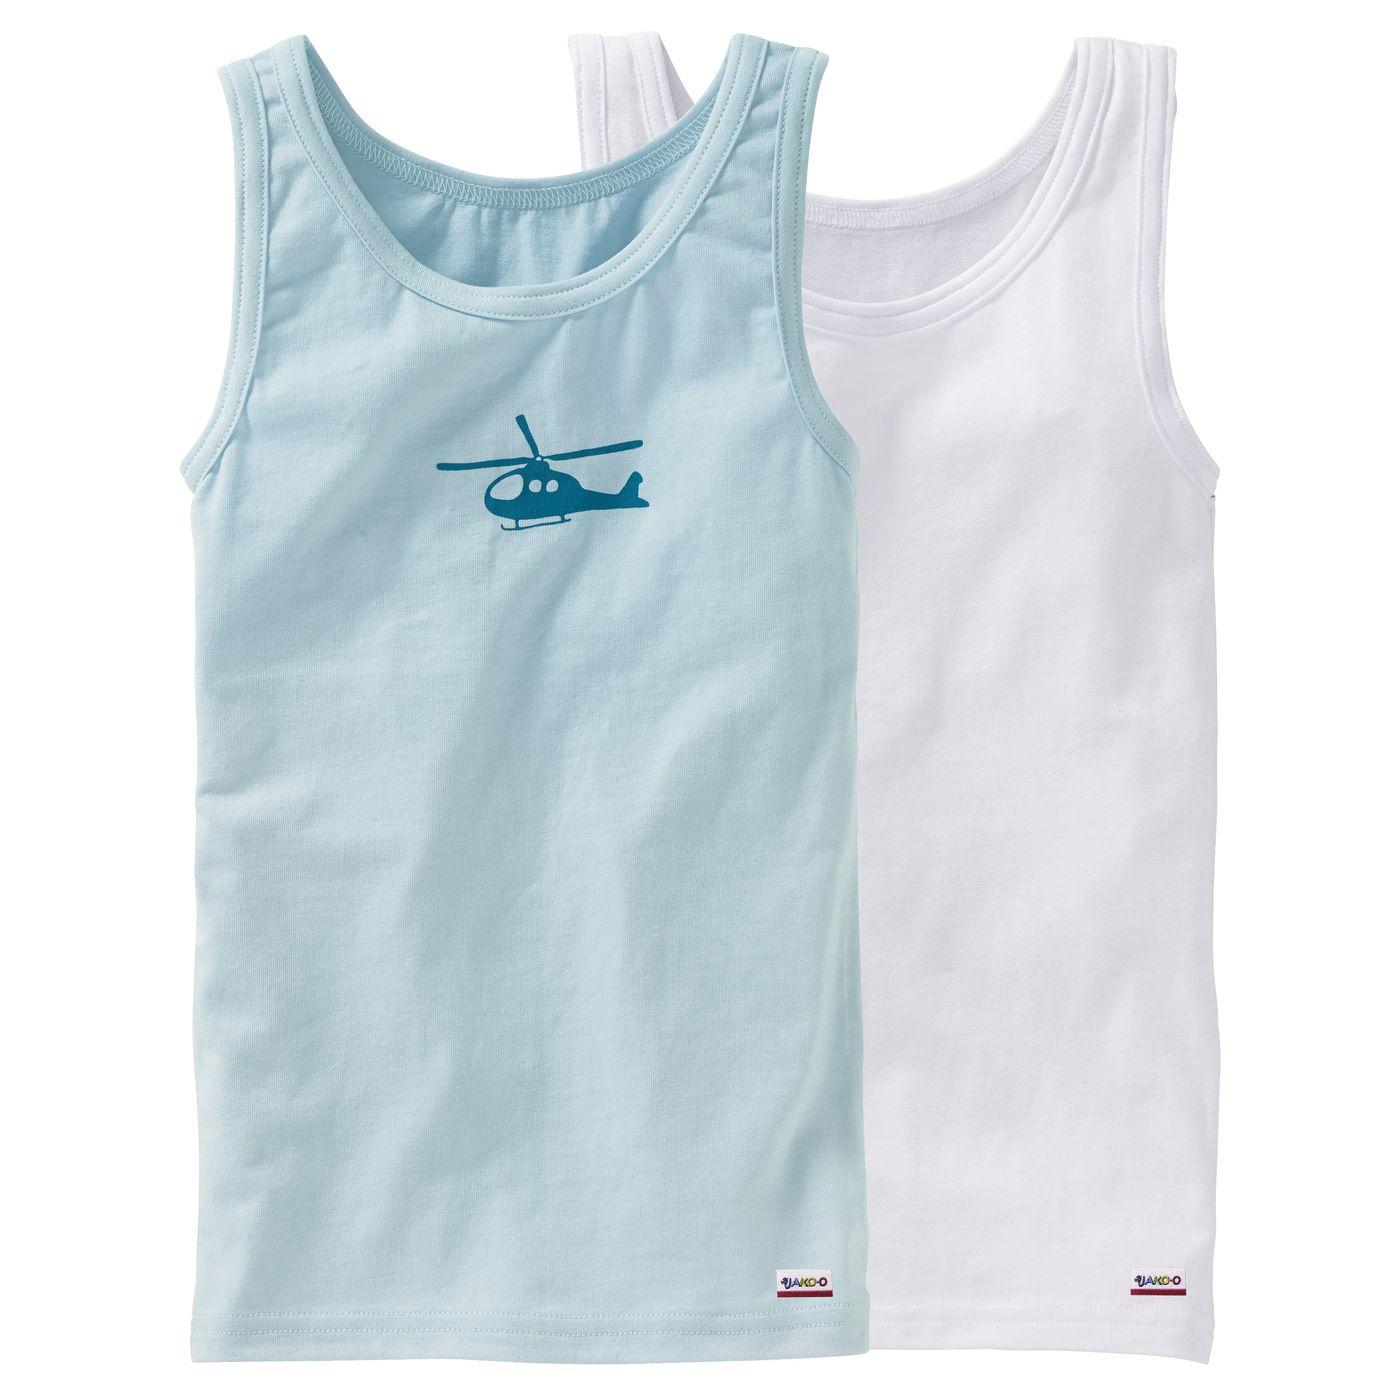 Мальчики рубашки 2-Pack